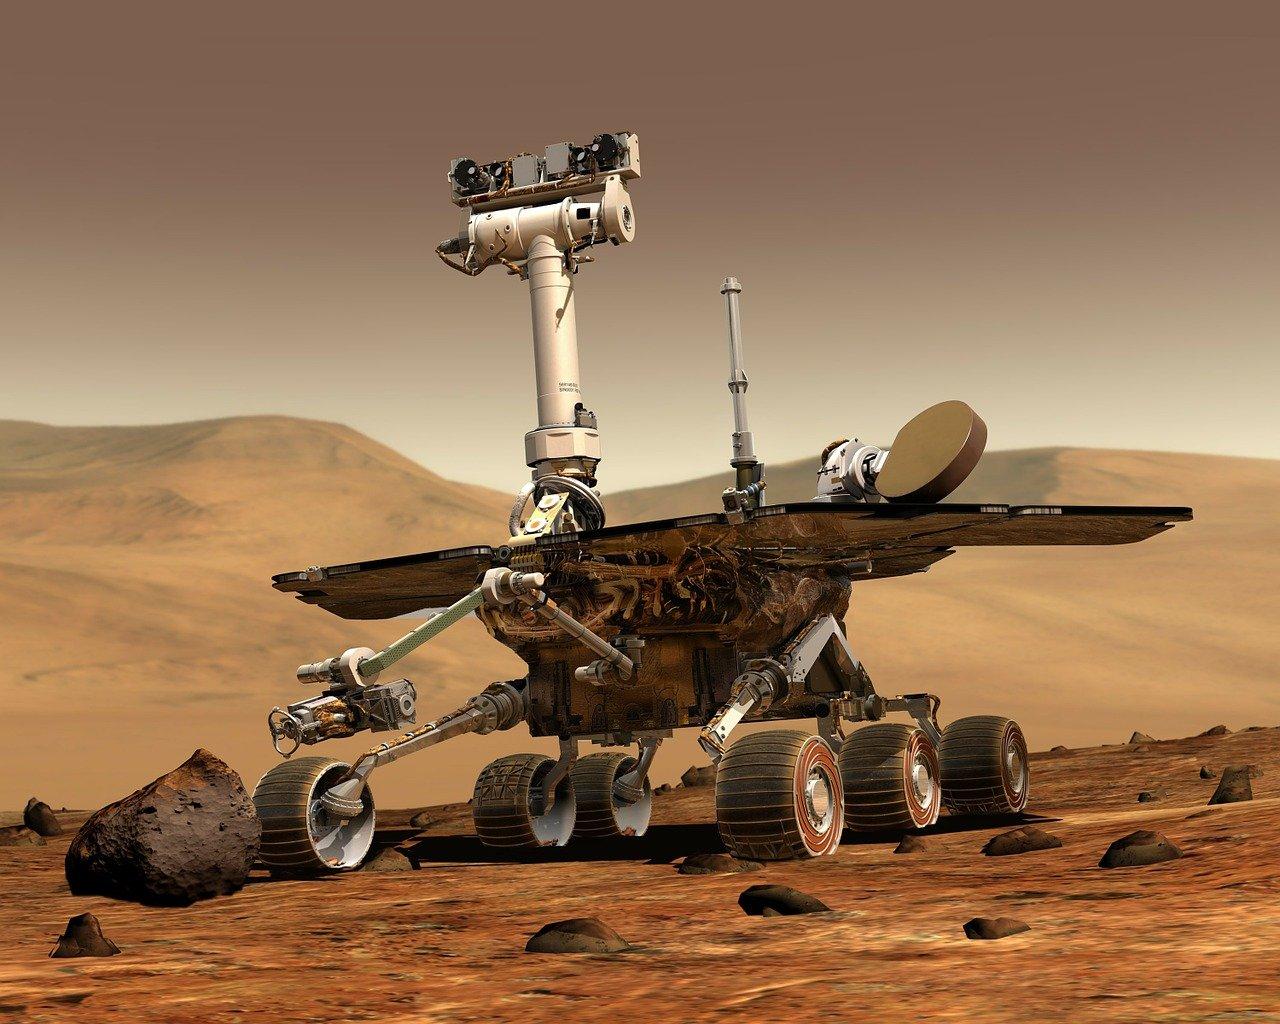 L'un des nombreux rovers envoyés par la NASA sur Mars